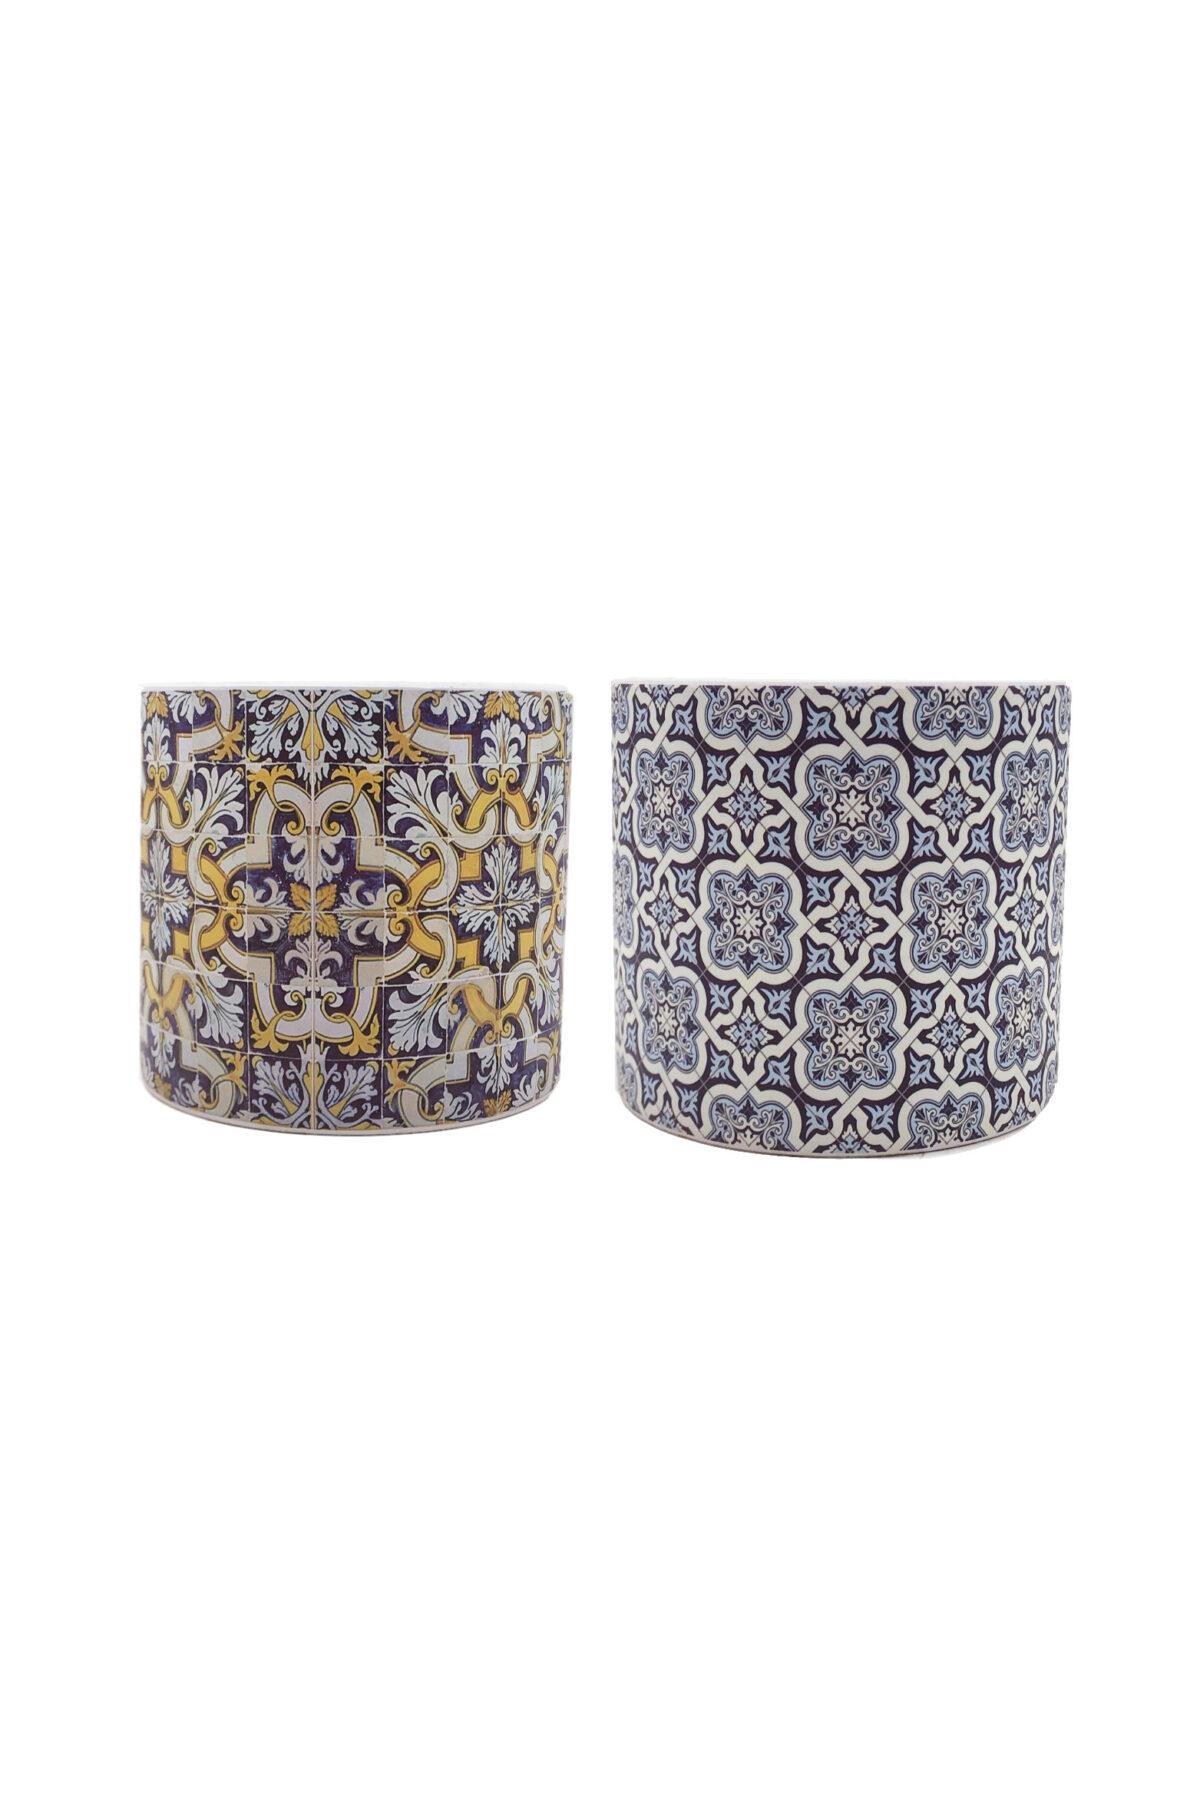 Set 2 Vasi caspò portapiante in ceramica Mix design maioliche blu, celesti e gialle d.13,8 h. 12 cm